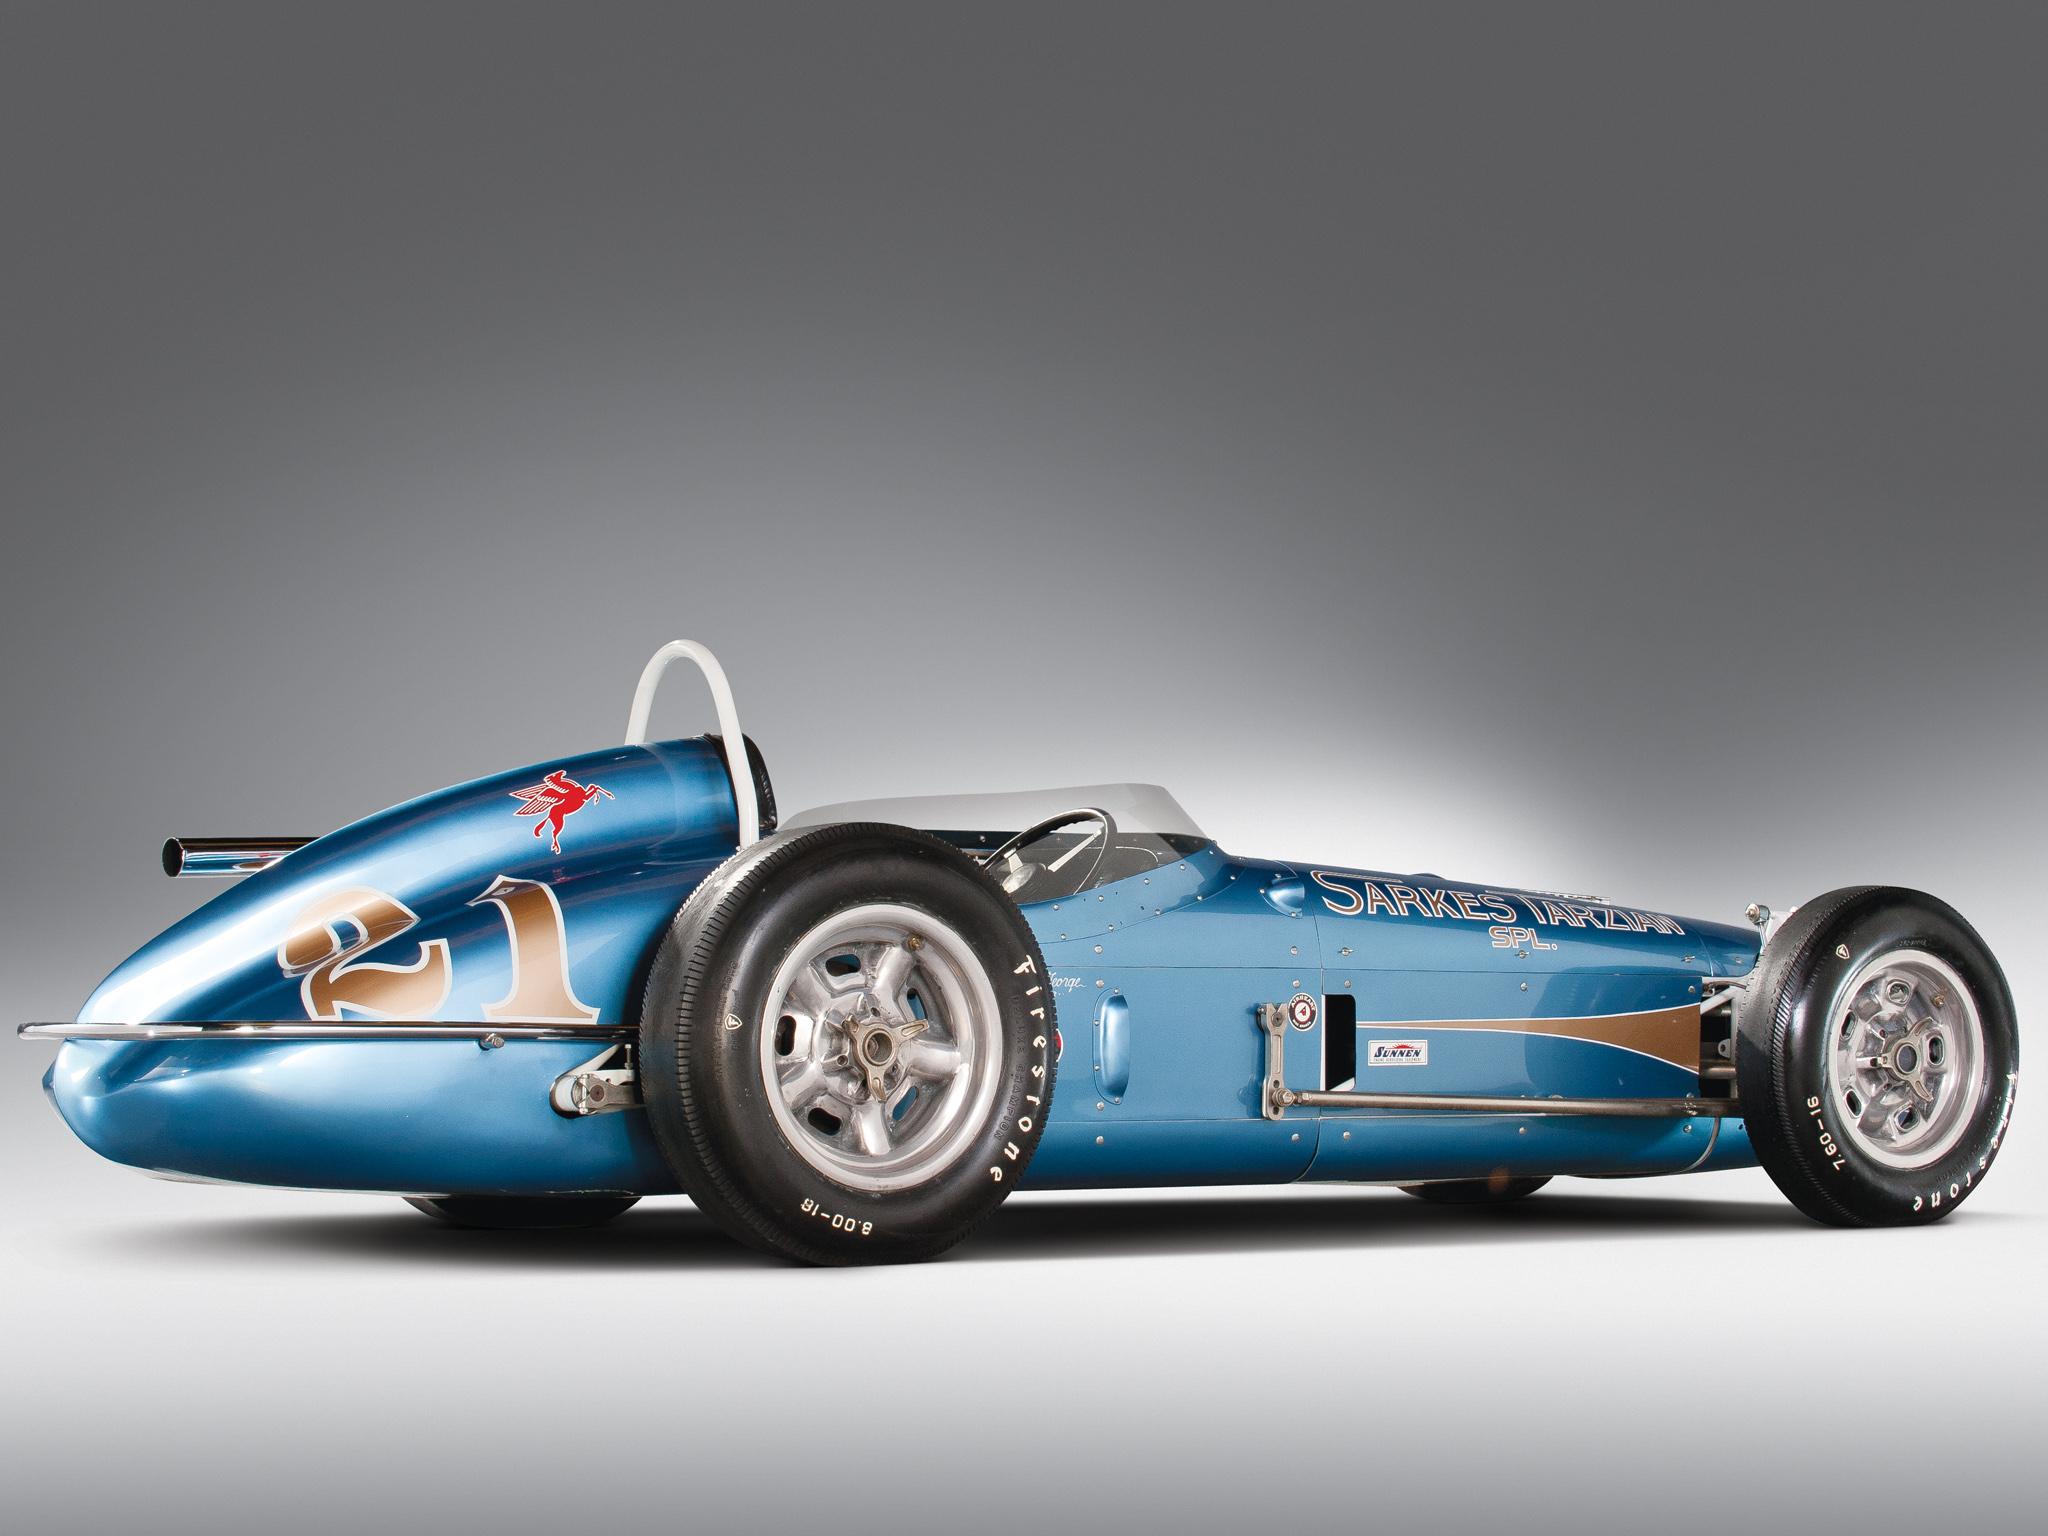 3840x1080 Wallpaper Classic Car Lesovsky Indianapolis Roadster 1962 Full Hd Wallpaper And